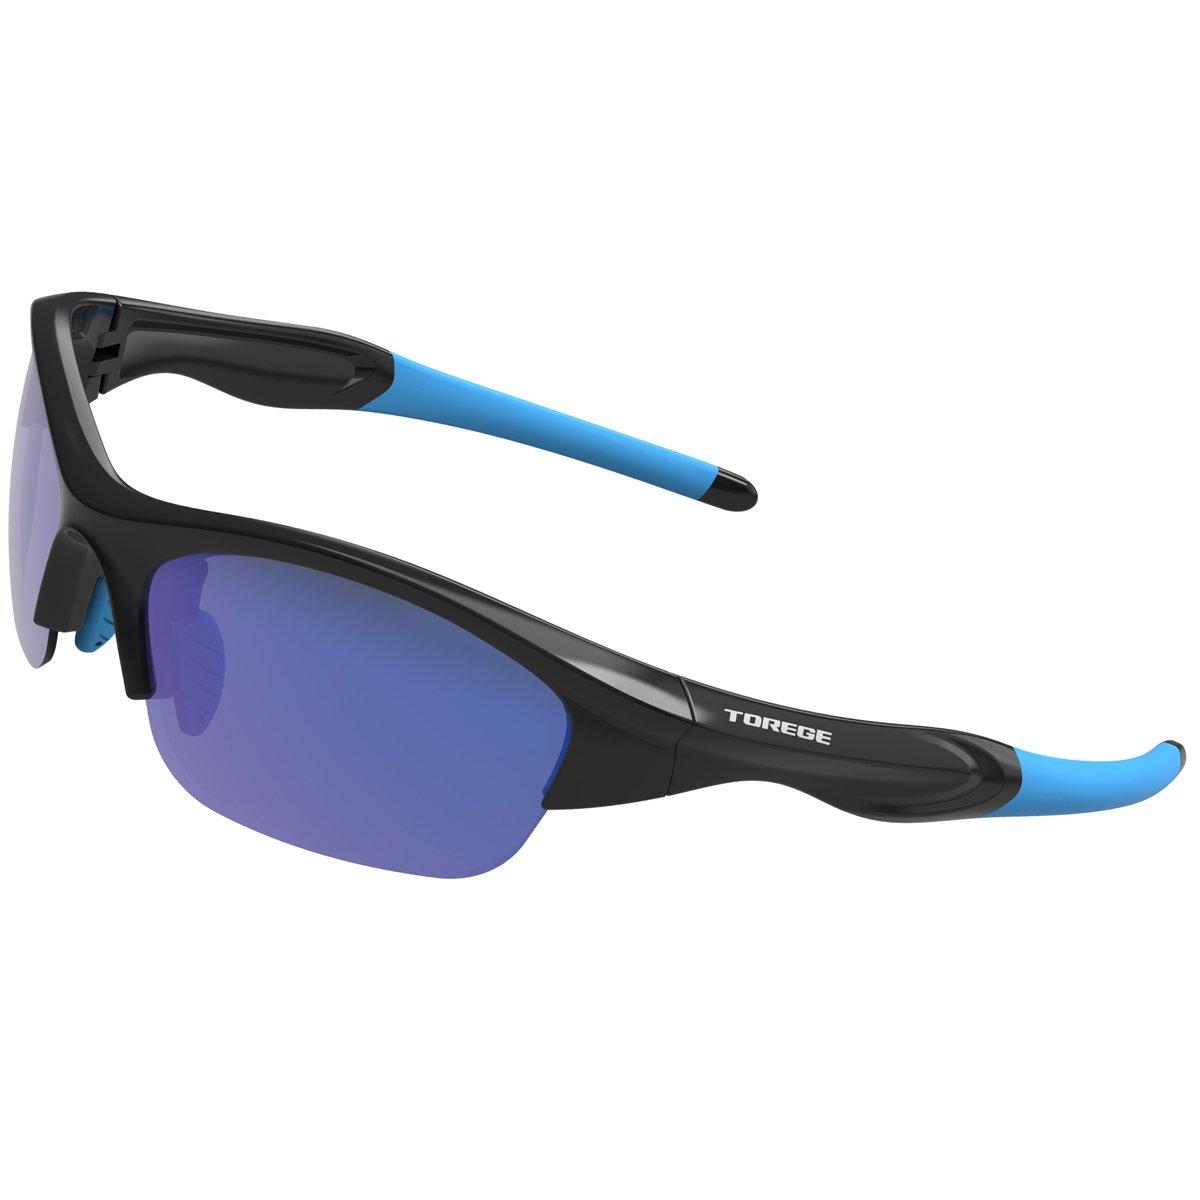 TOREGE Tr90 Flexible Kids Sports Sunglasses Polarized Glasses Junior Boys Girls Age 3-15 TR041 (Black&Blue Blue Lens)